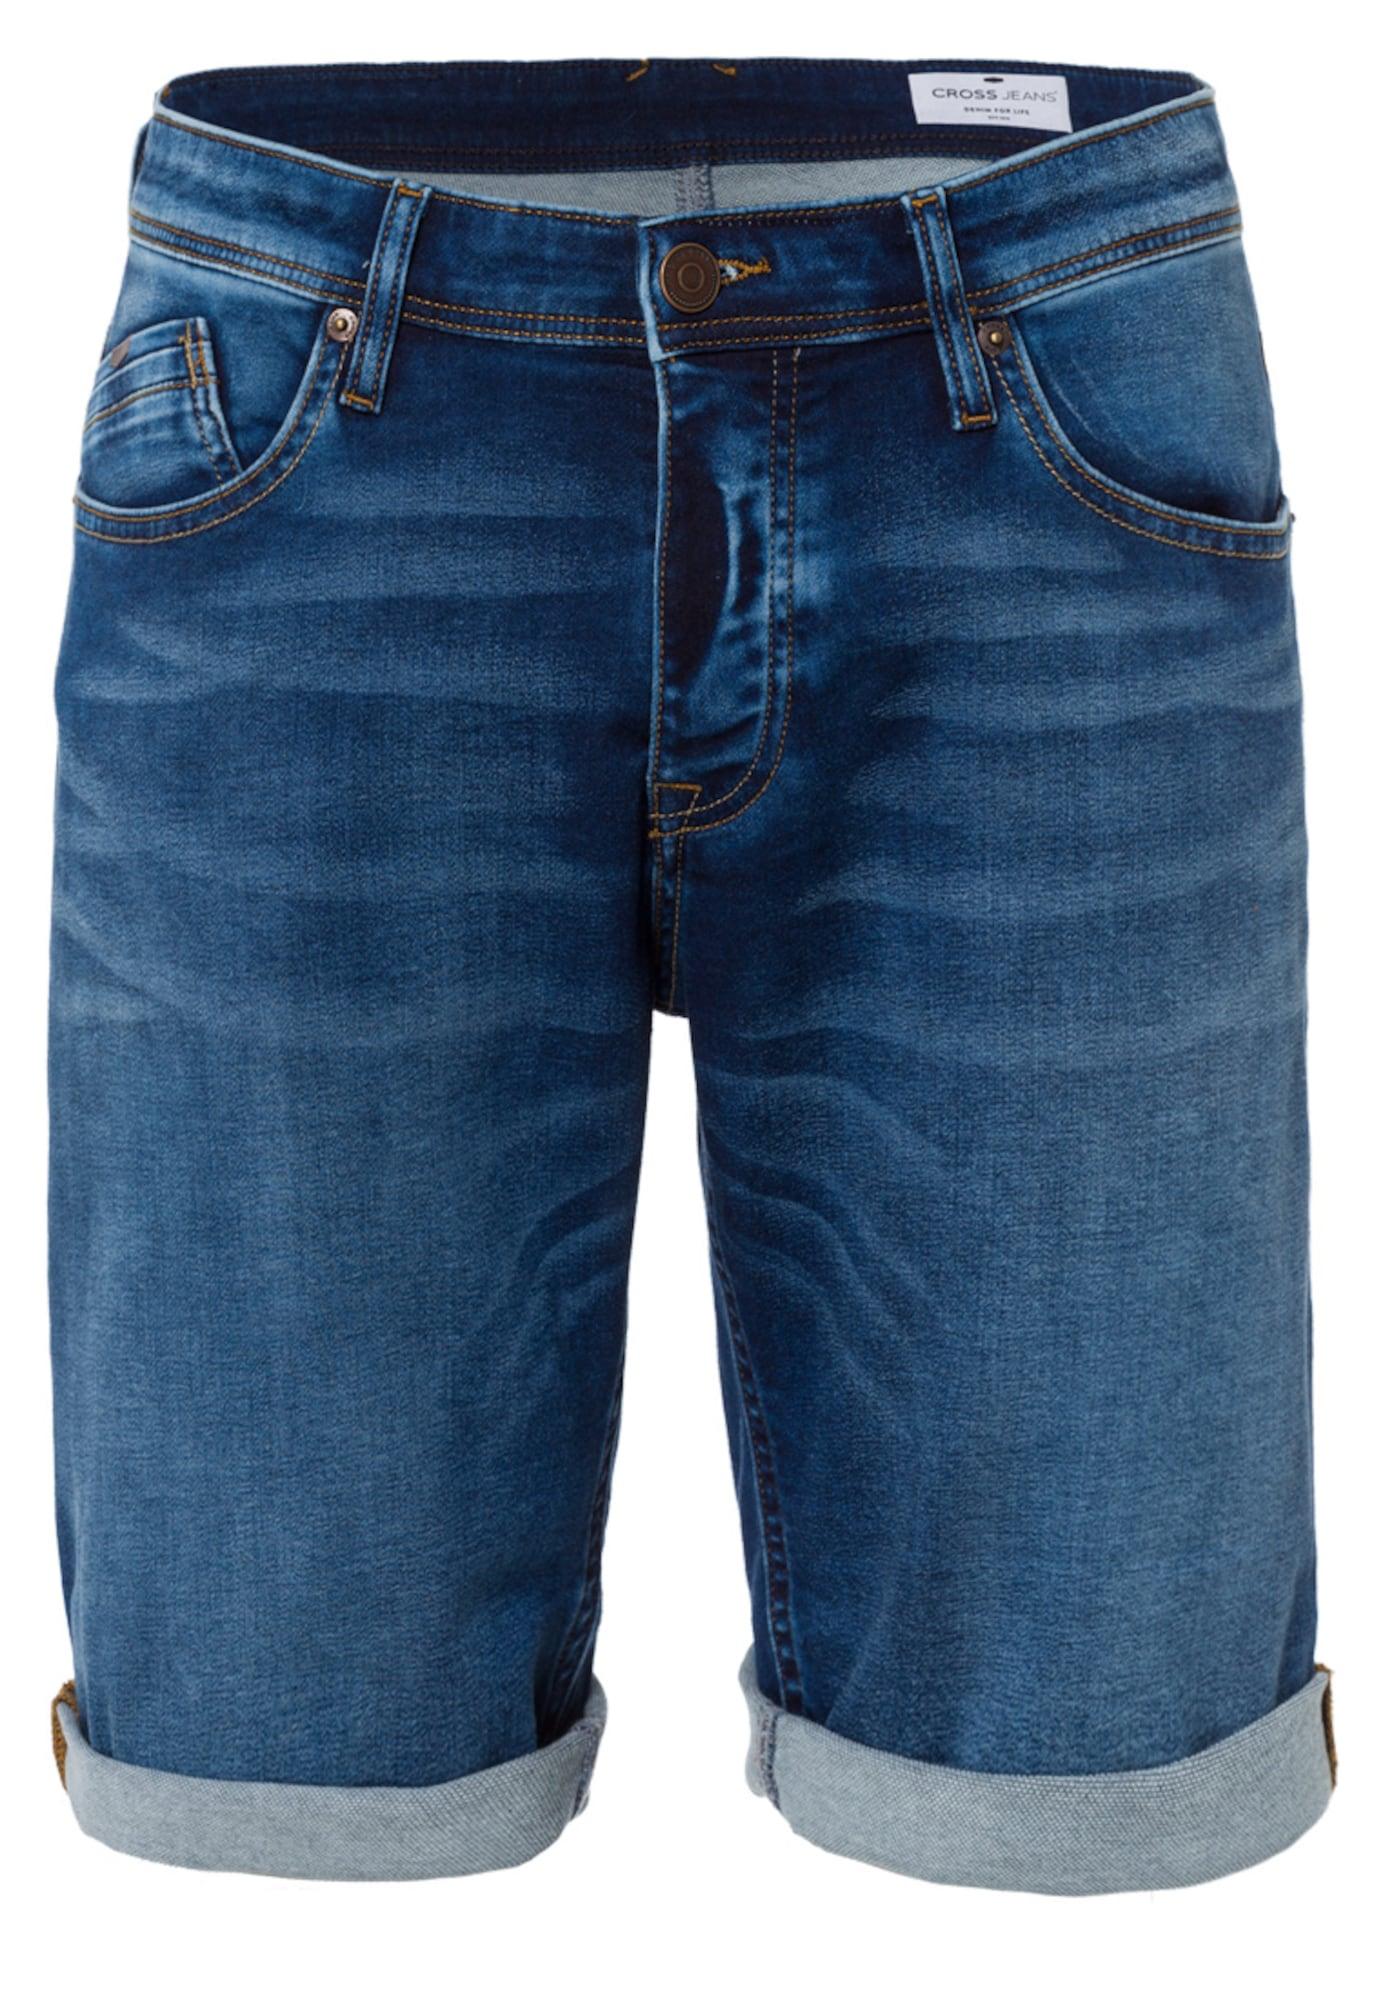 Jeansshorts 'Leom' | Bekleidung > Shorts & Bermudas > Jeans Shorts | cross jeans